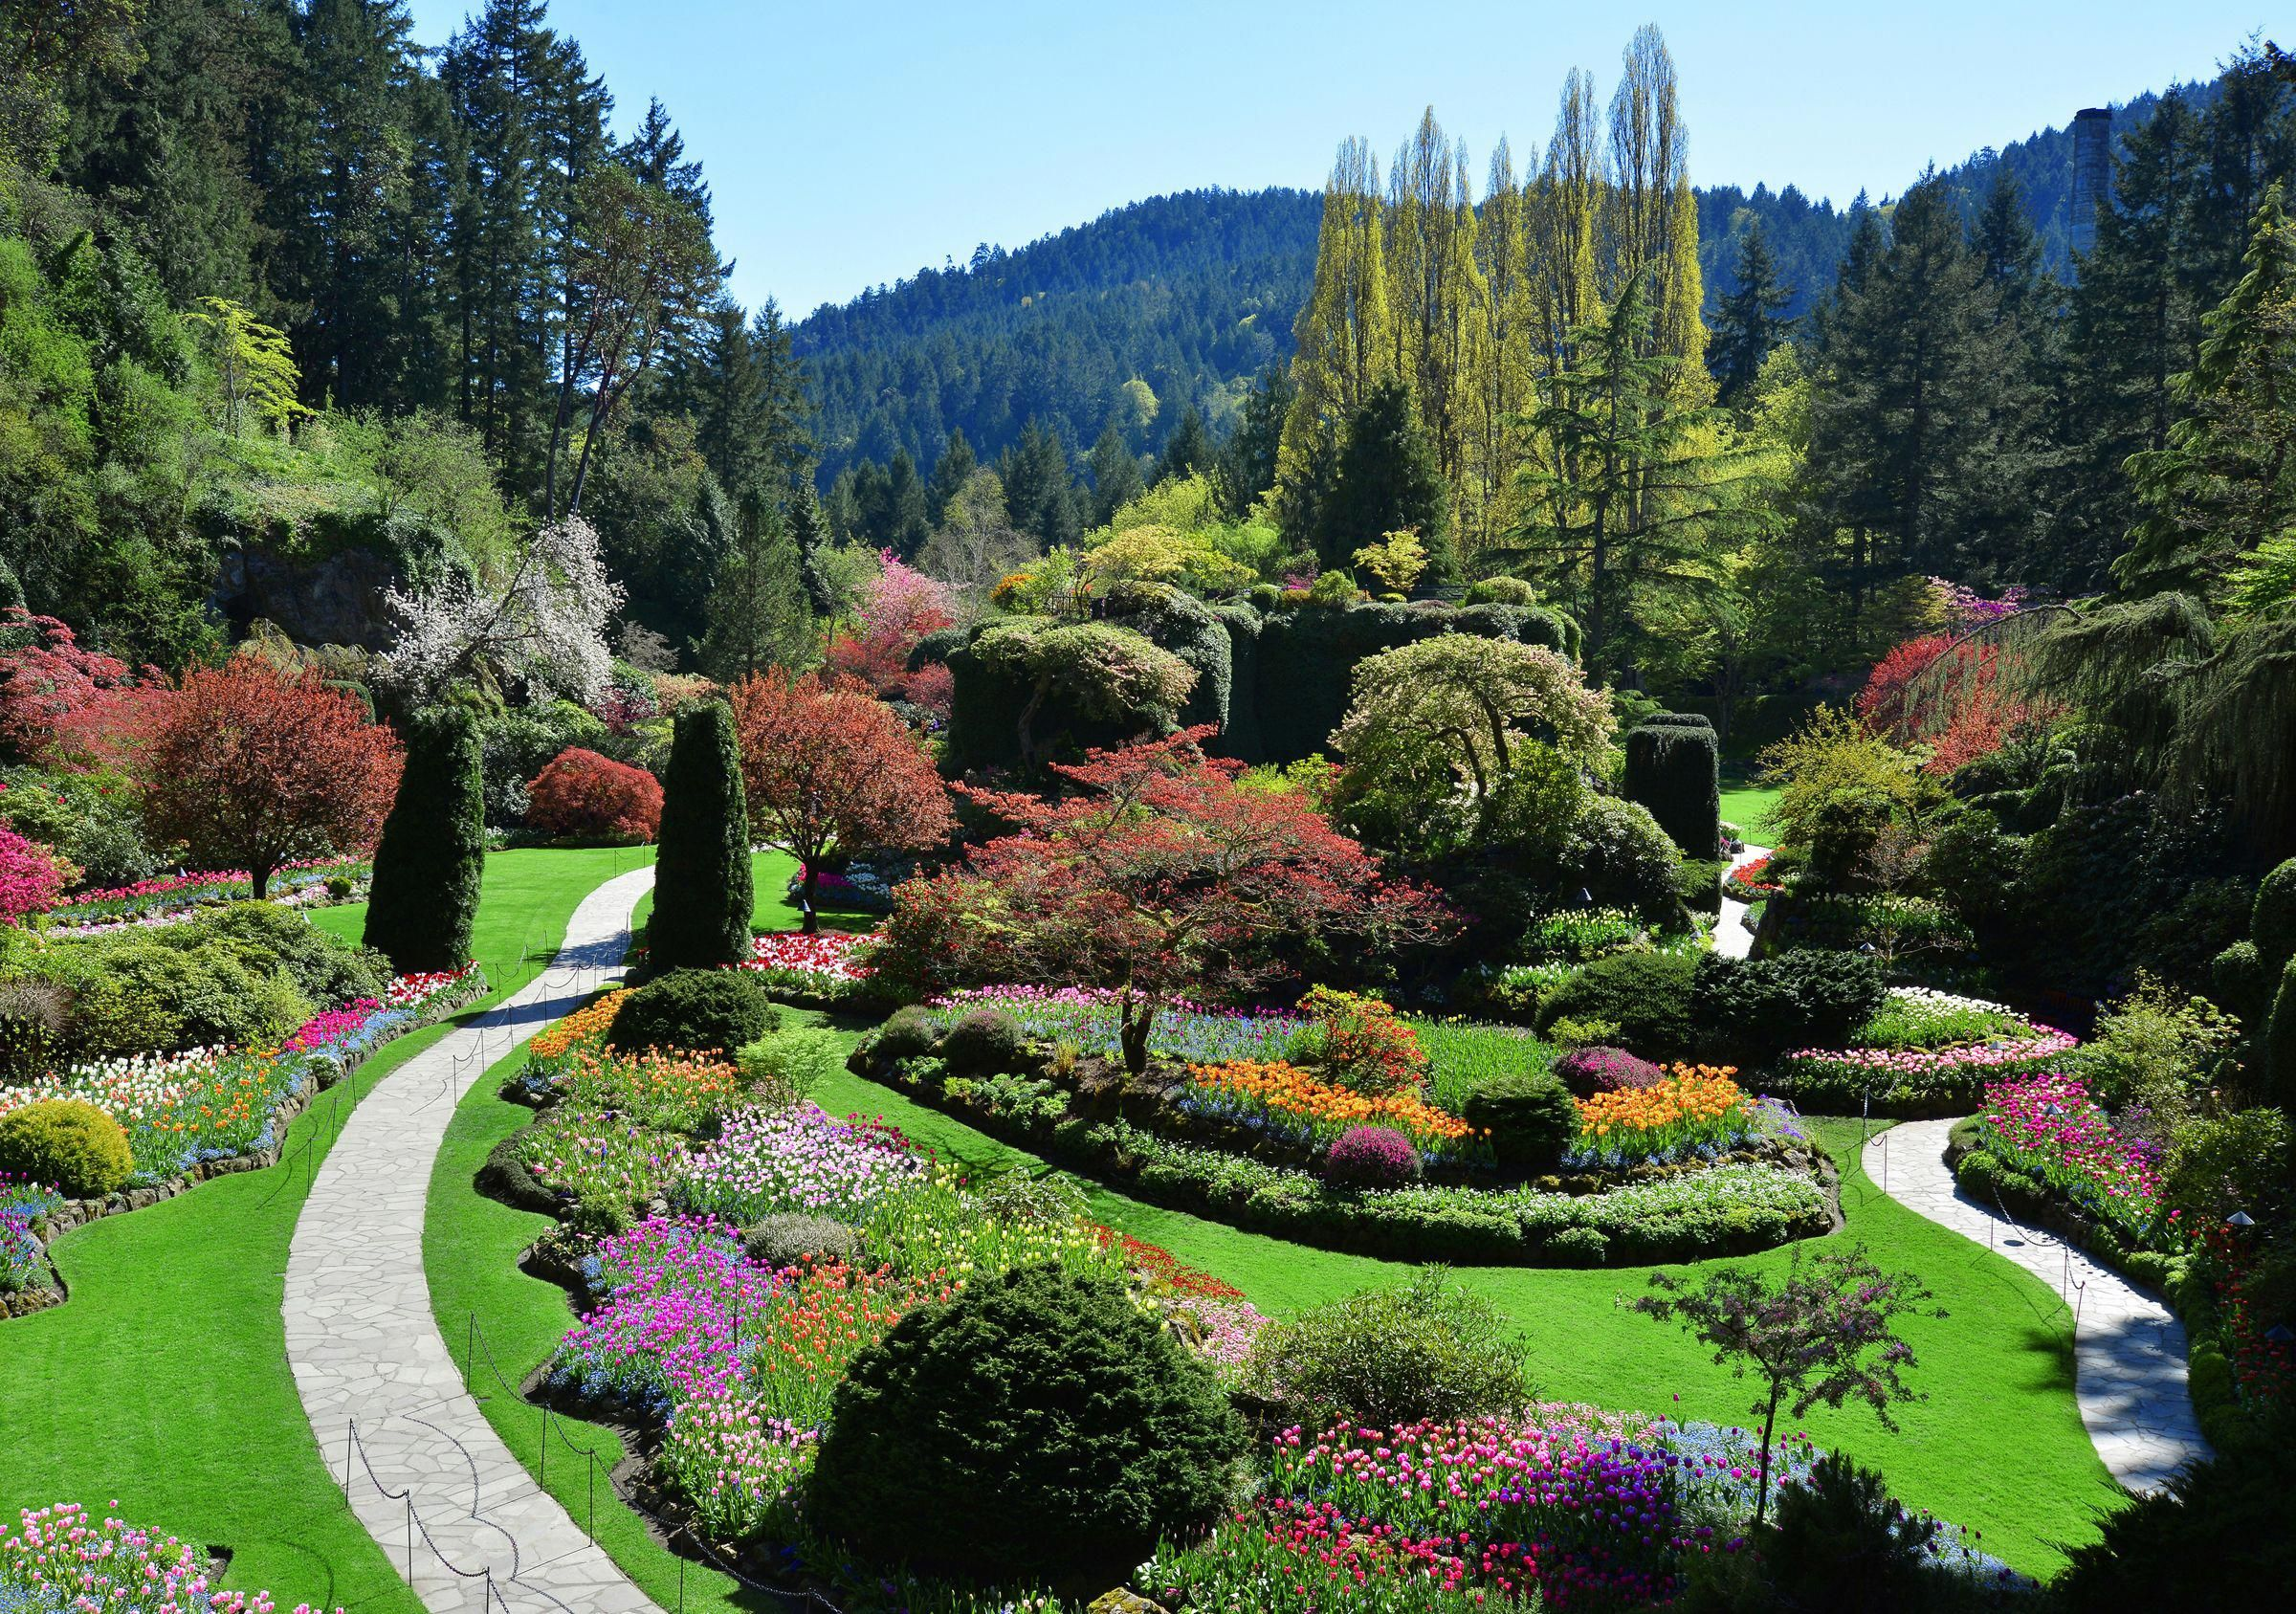 b3c417844e9c30dce41419b56b8d4061 - How Much Is Admission To Butchart Gardens